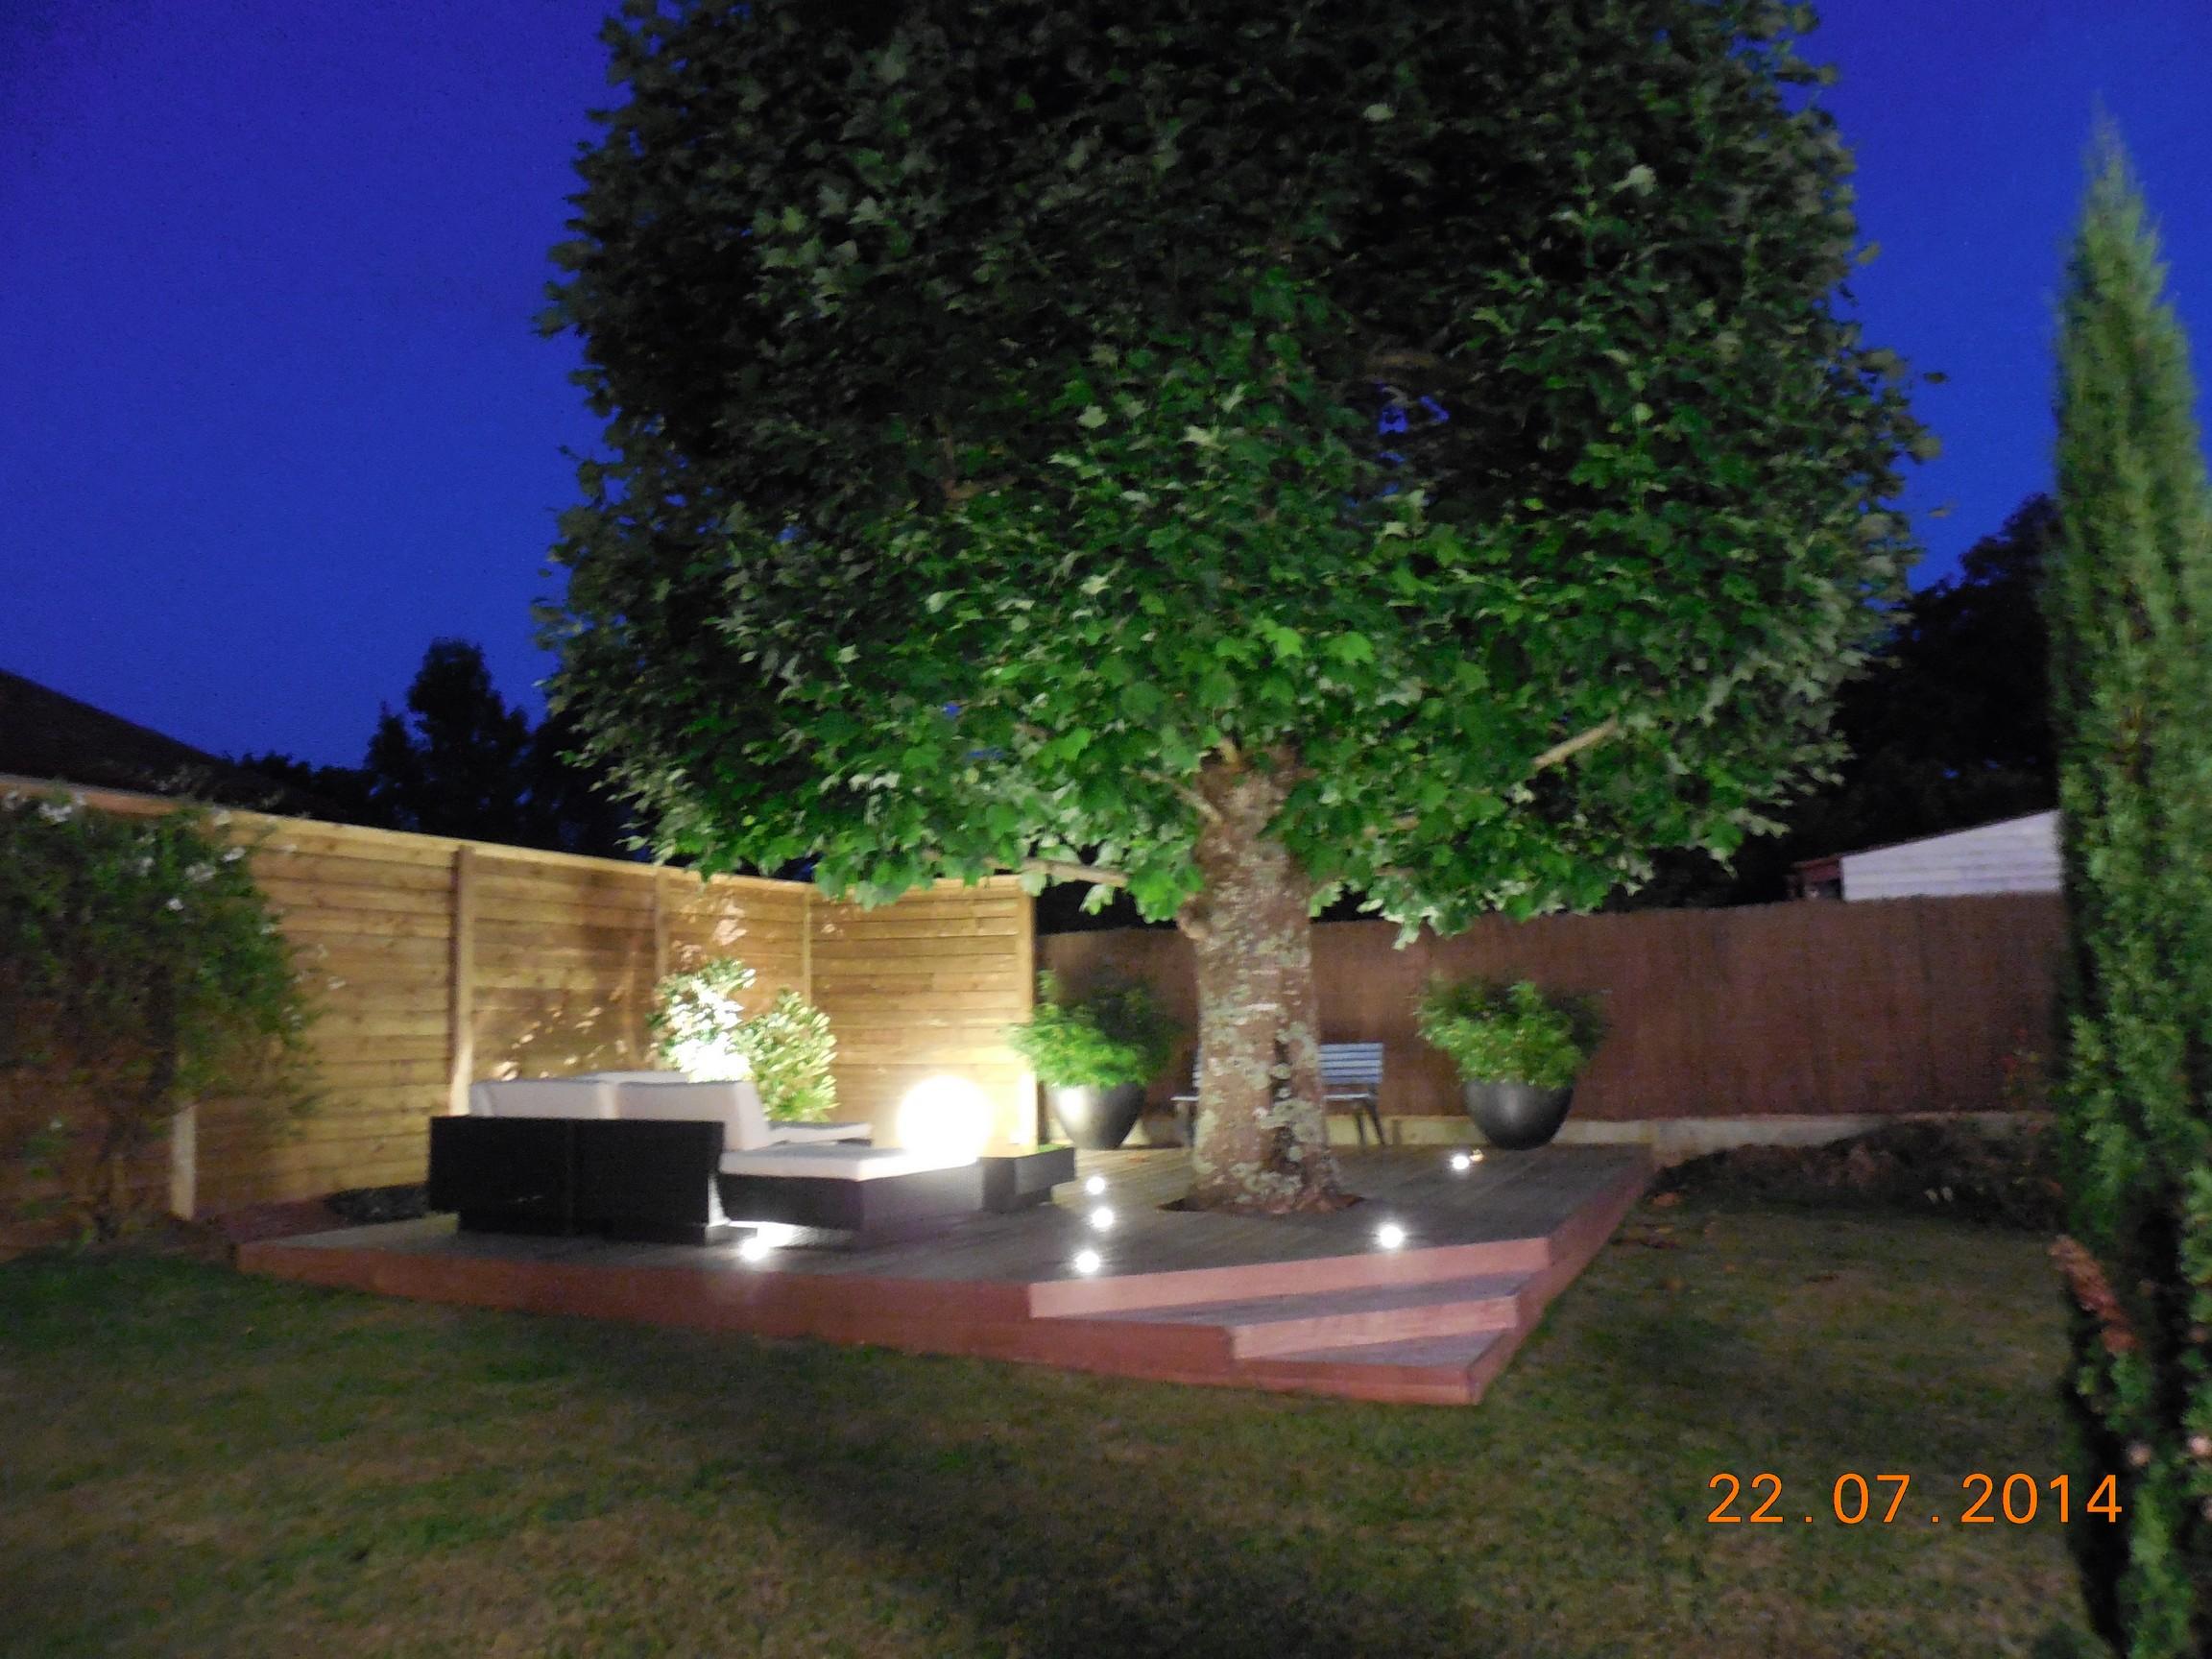 terrasse en ipe ustaritz 64 cl ture bois spa terrasse avec clairage int gr paysabois bois. Black Bedroom Furniture Sets. Home Design Ideas